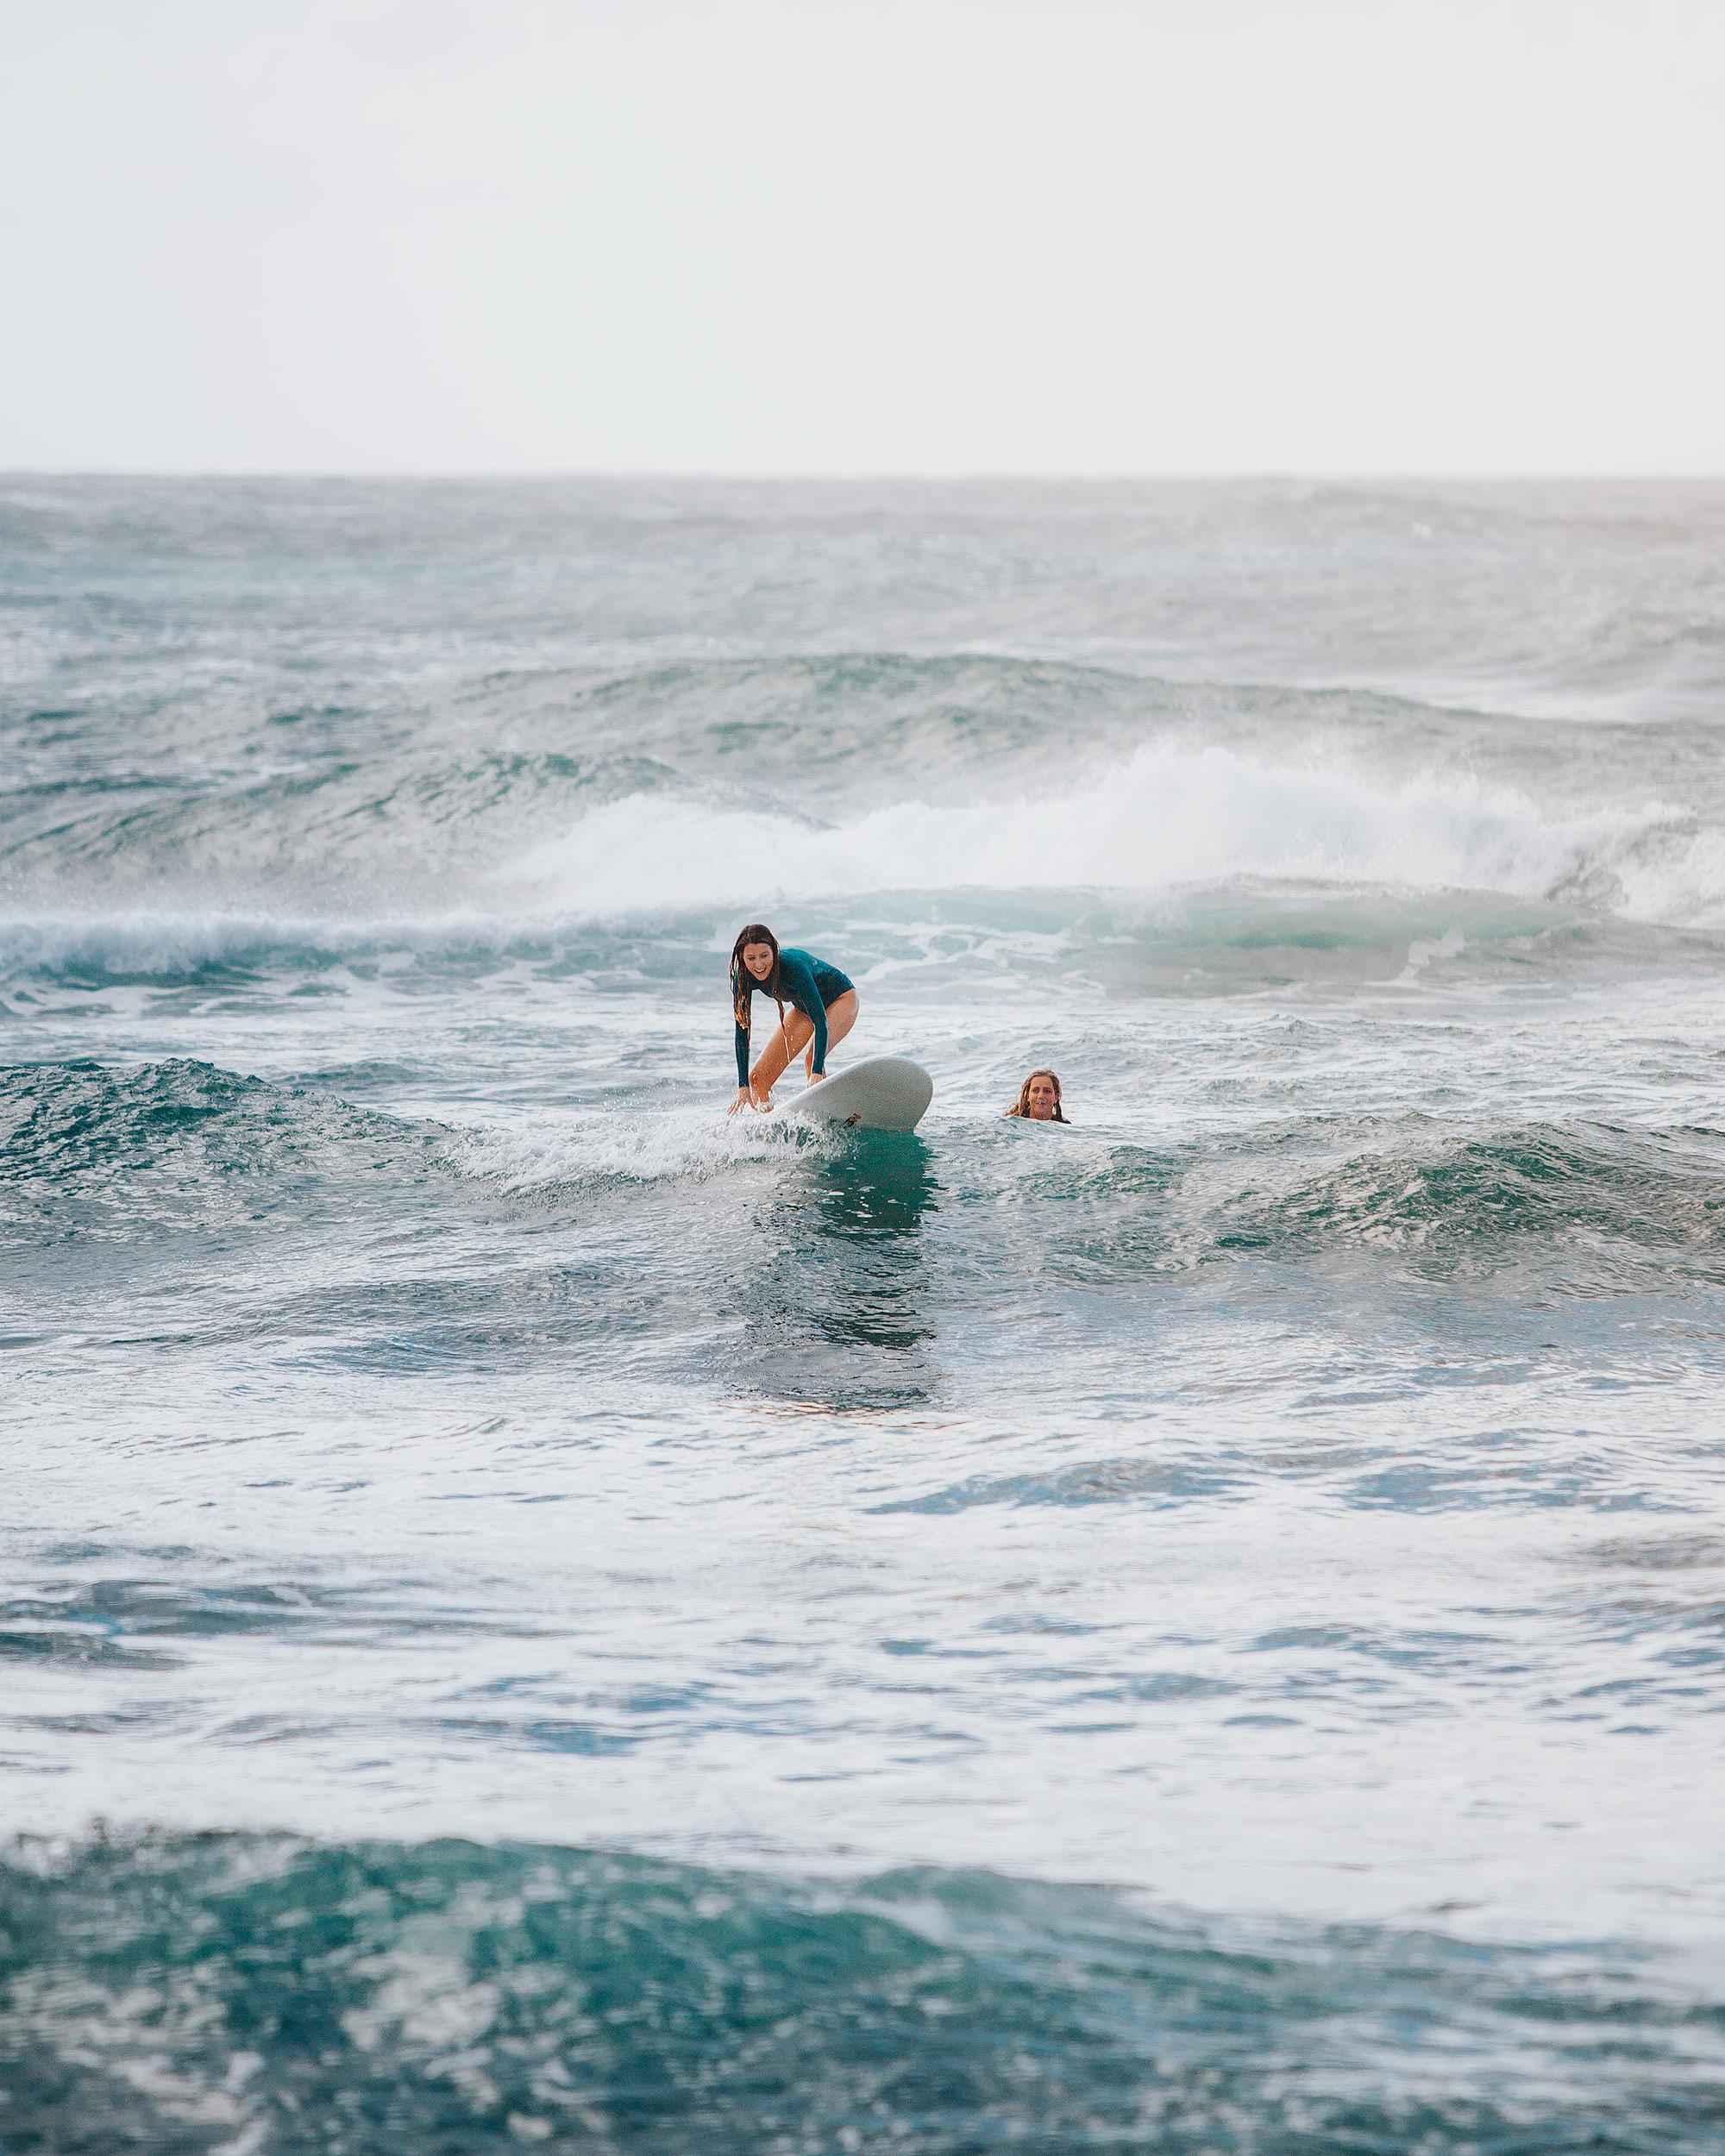 Hawaiian-Adventures-With-A-Surf-SensationCaroline-Marks-Renee-Roaming